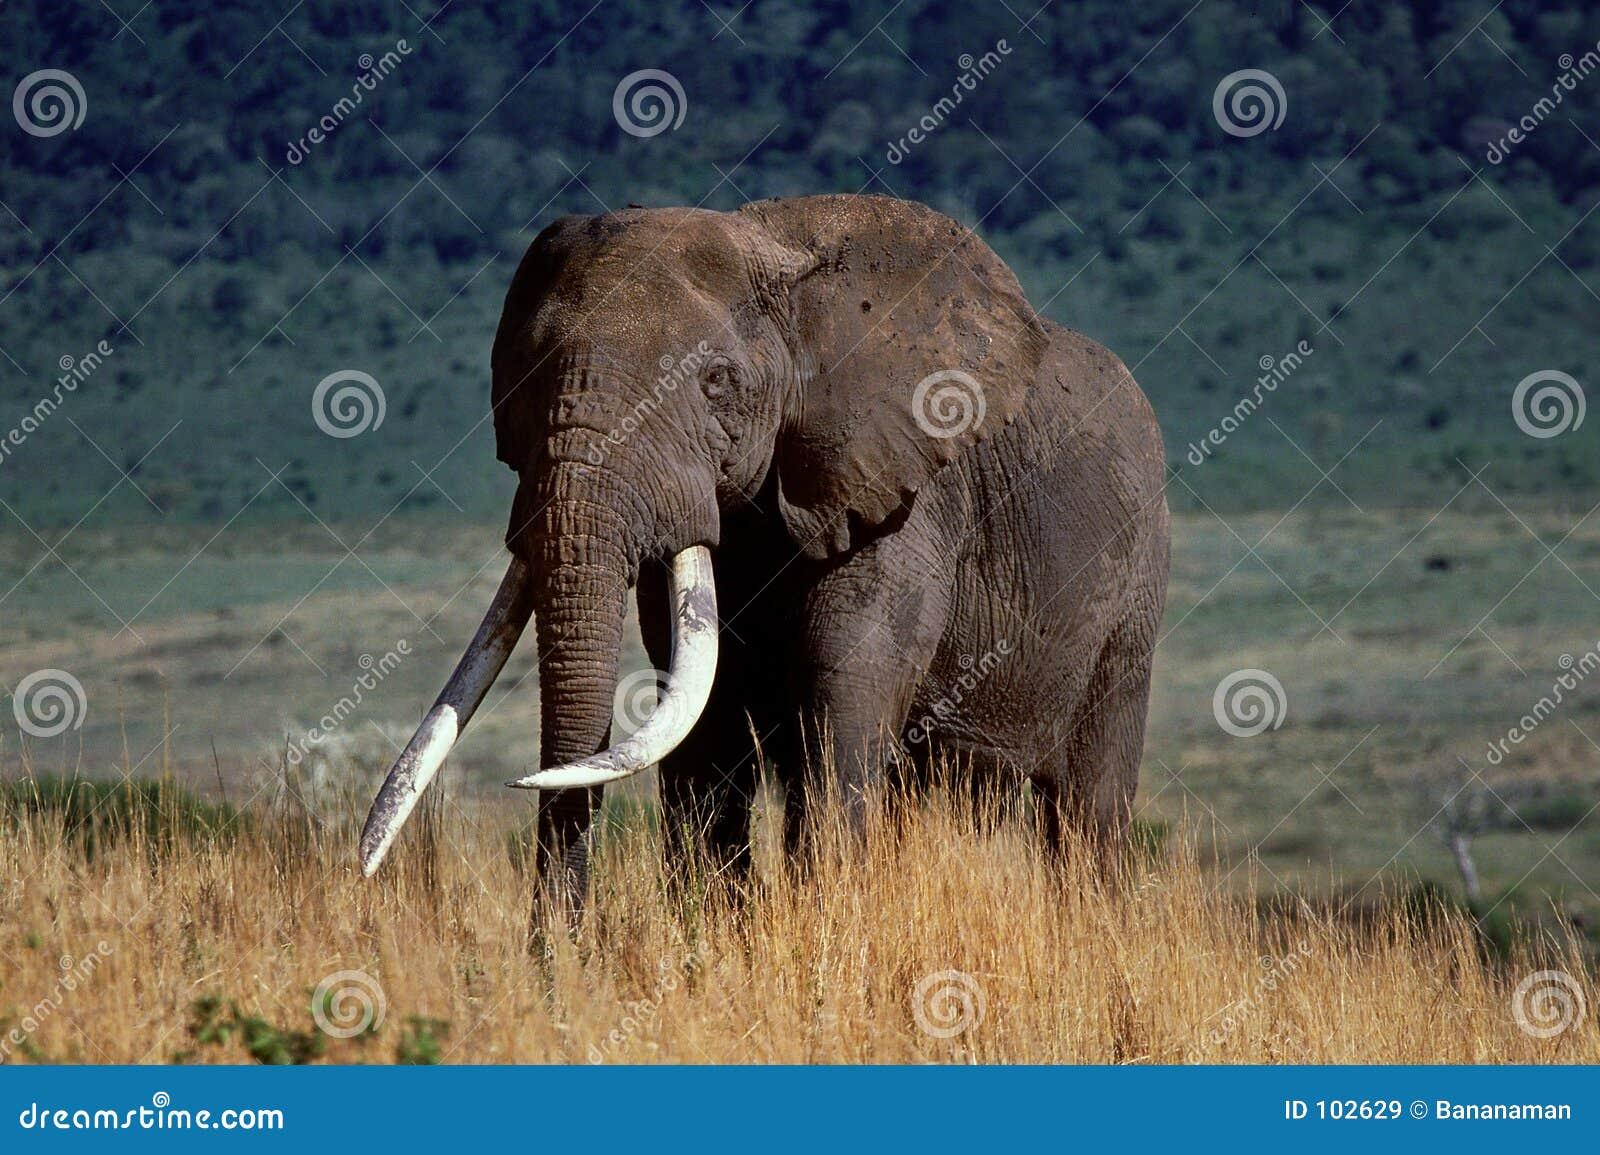 Crater elephant